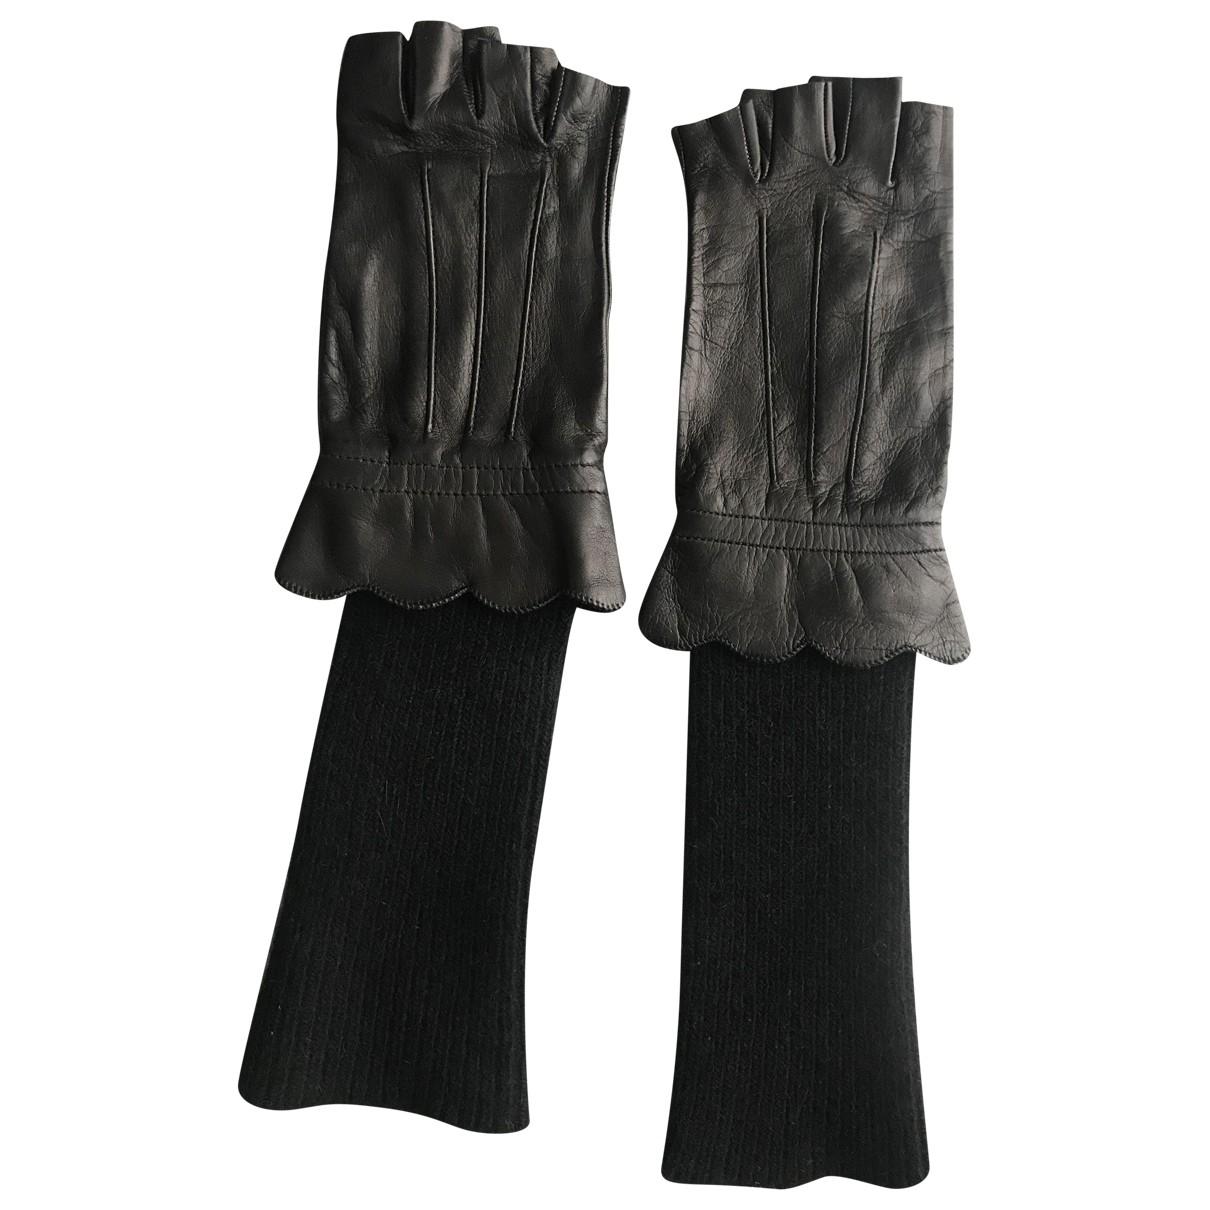 Moschino - Gants   pour femme en cuir - noir